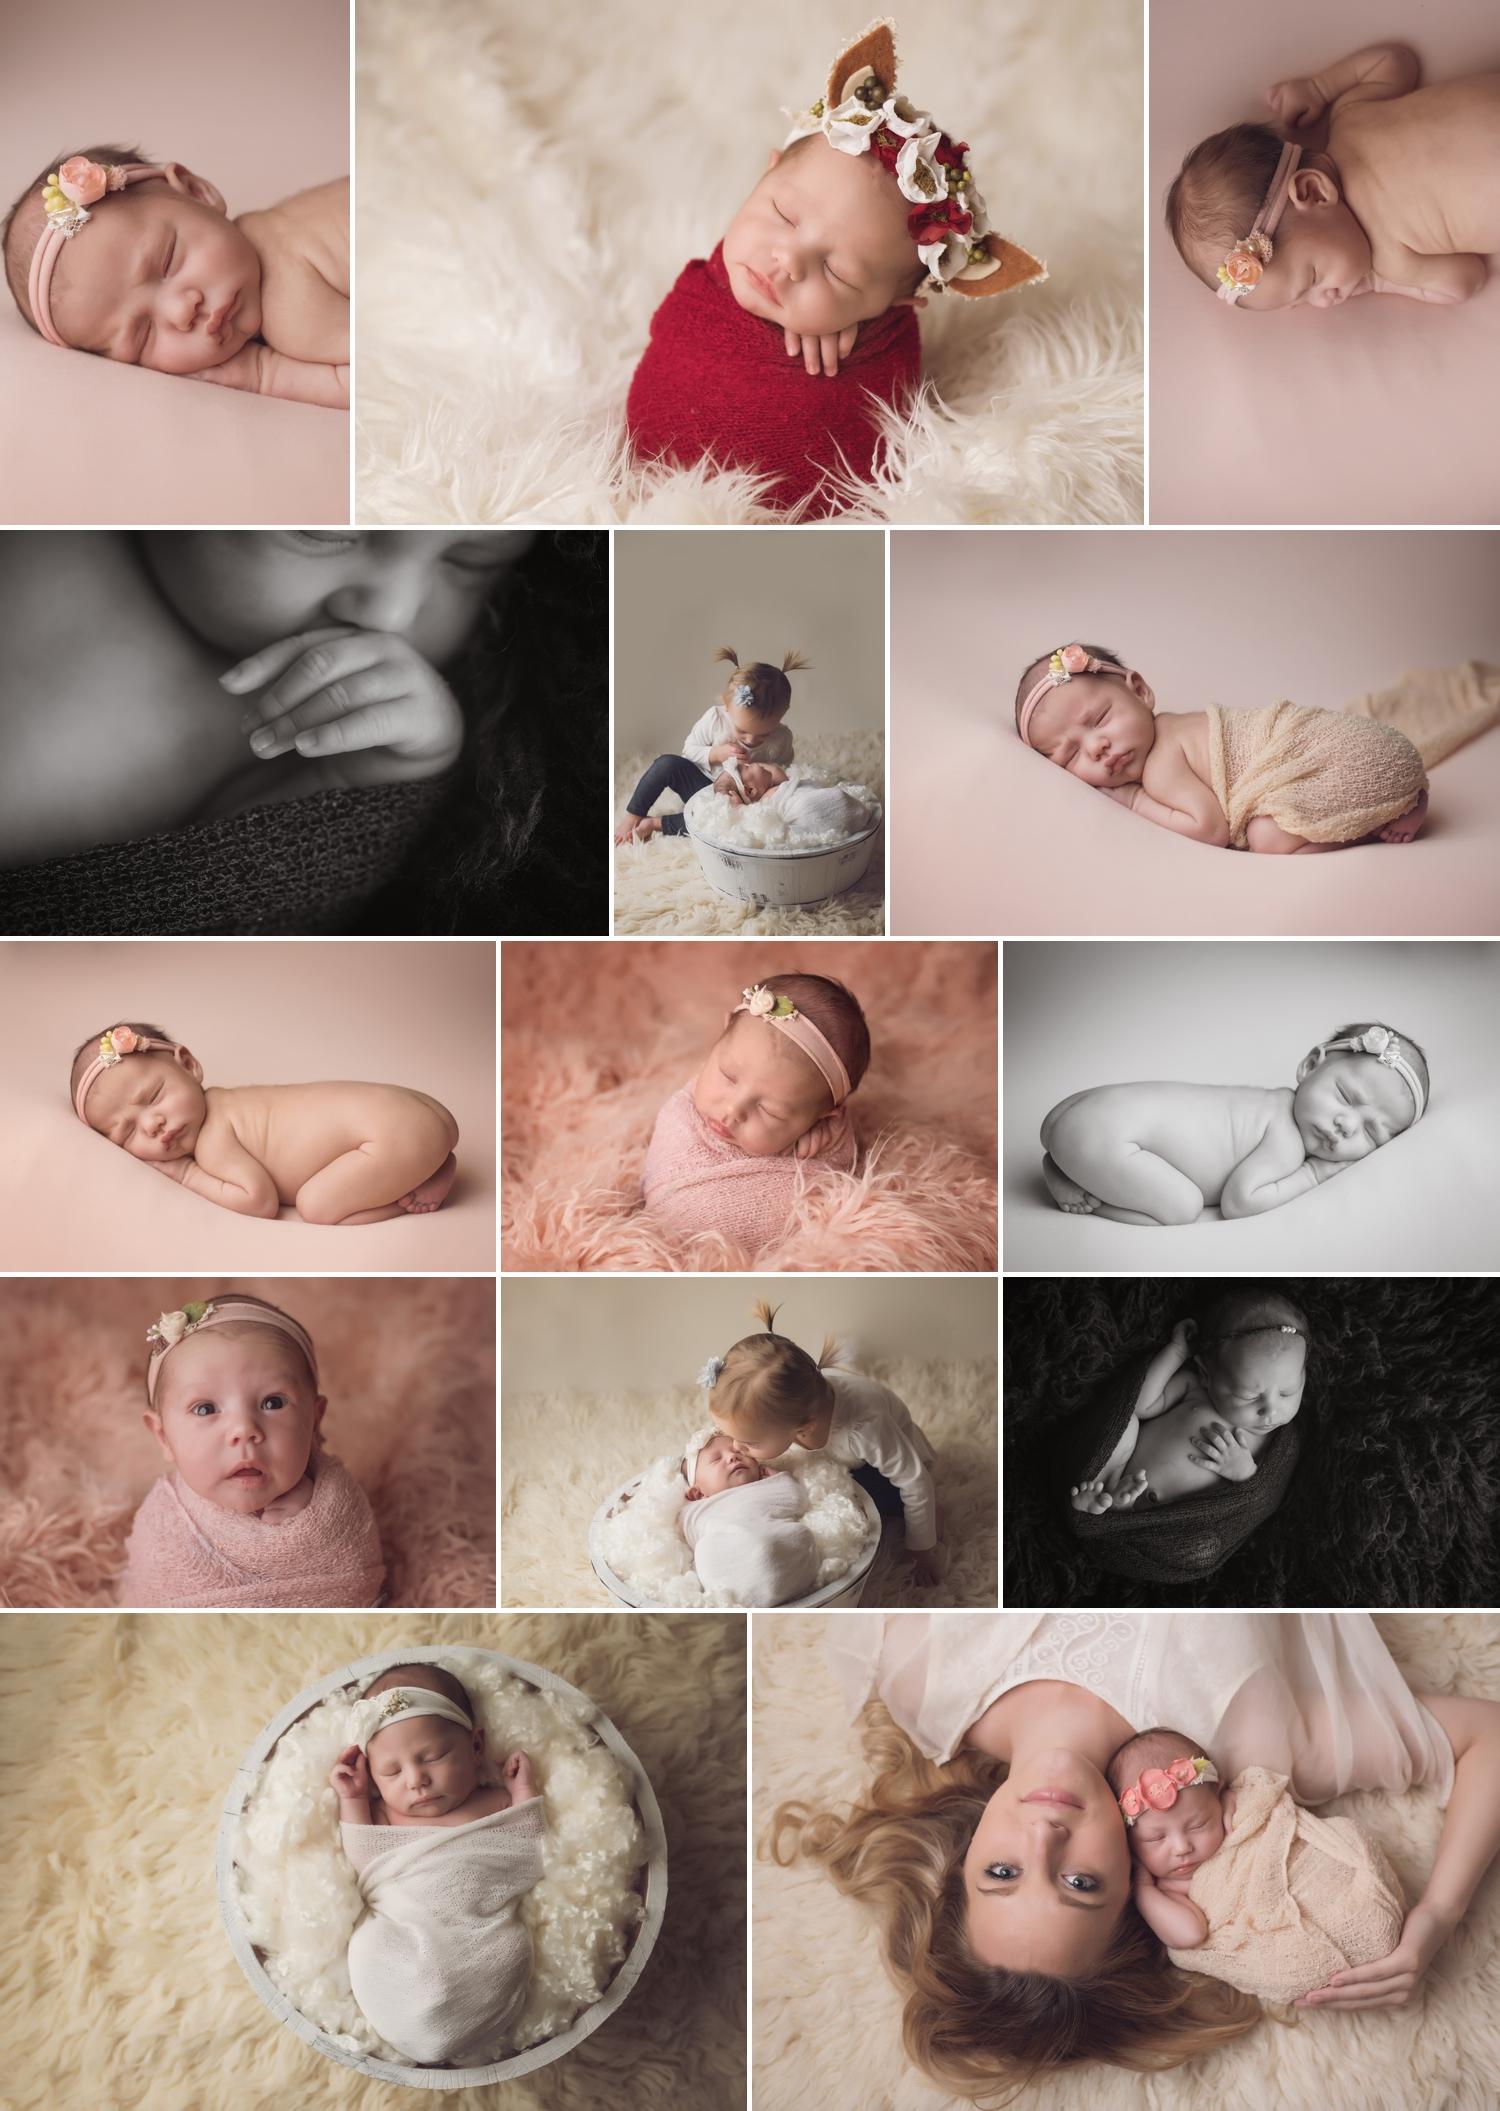 southwest-kansas-maternity-photography1 2.jpg